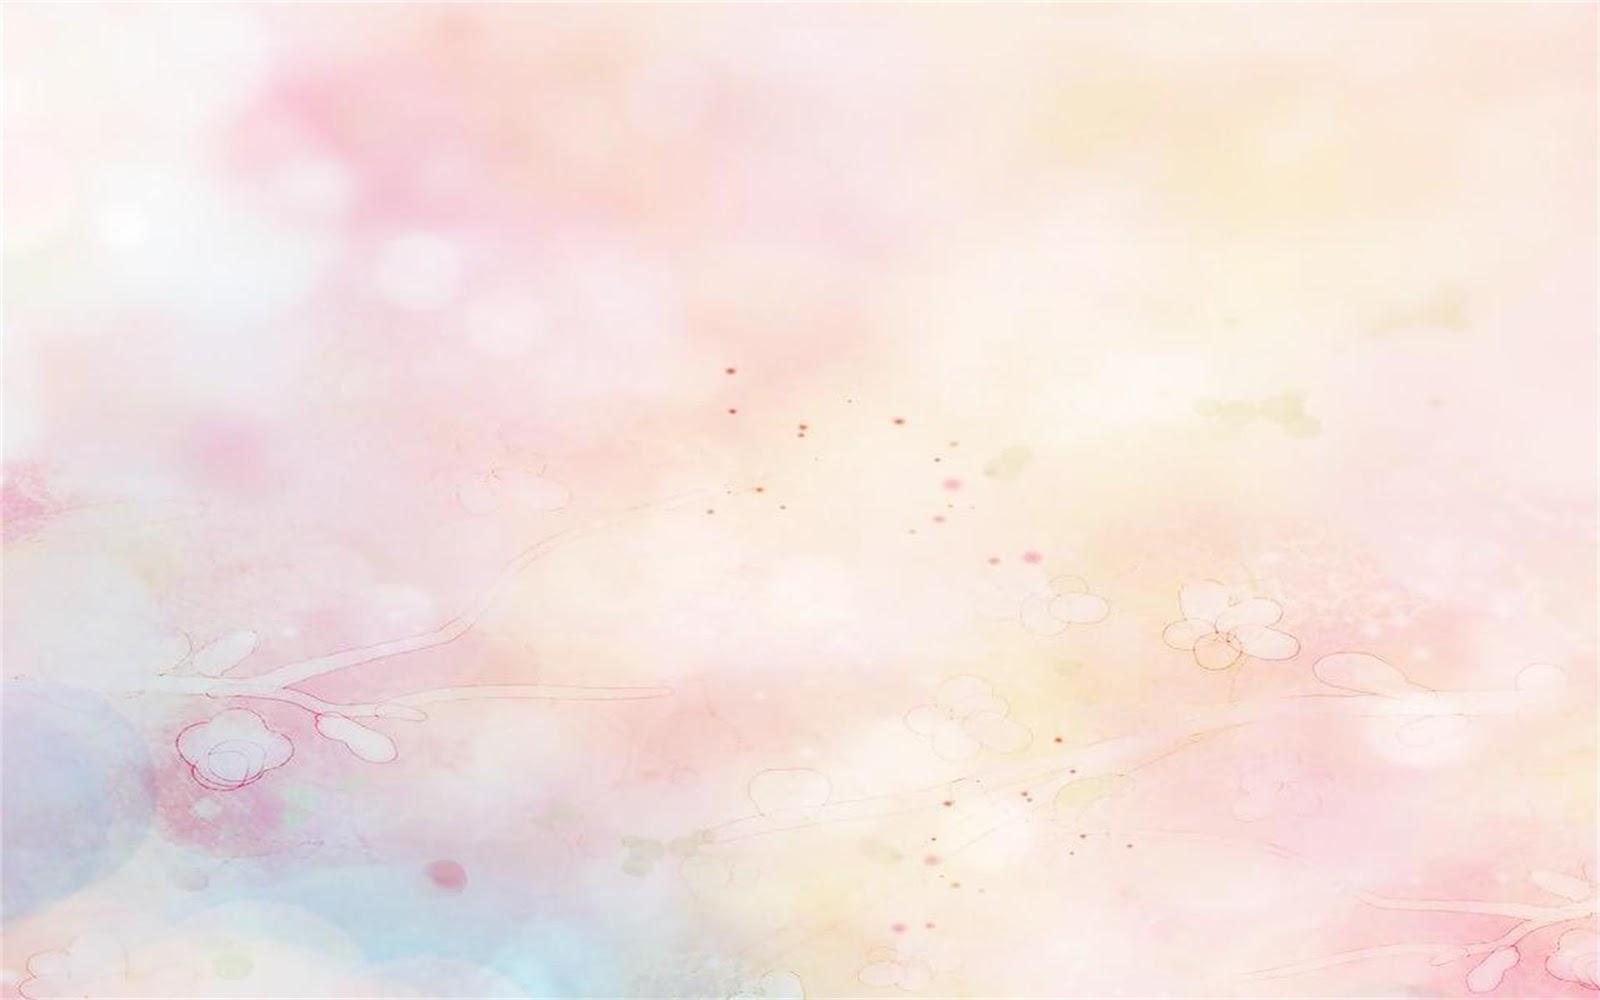 Watercolor peach background picture